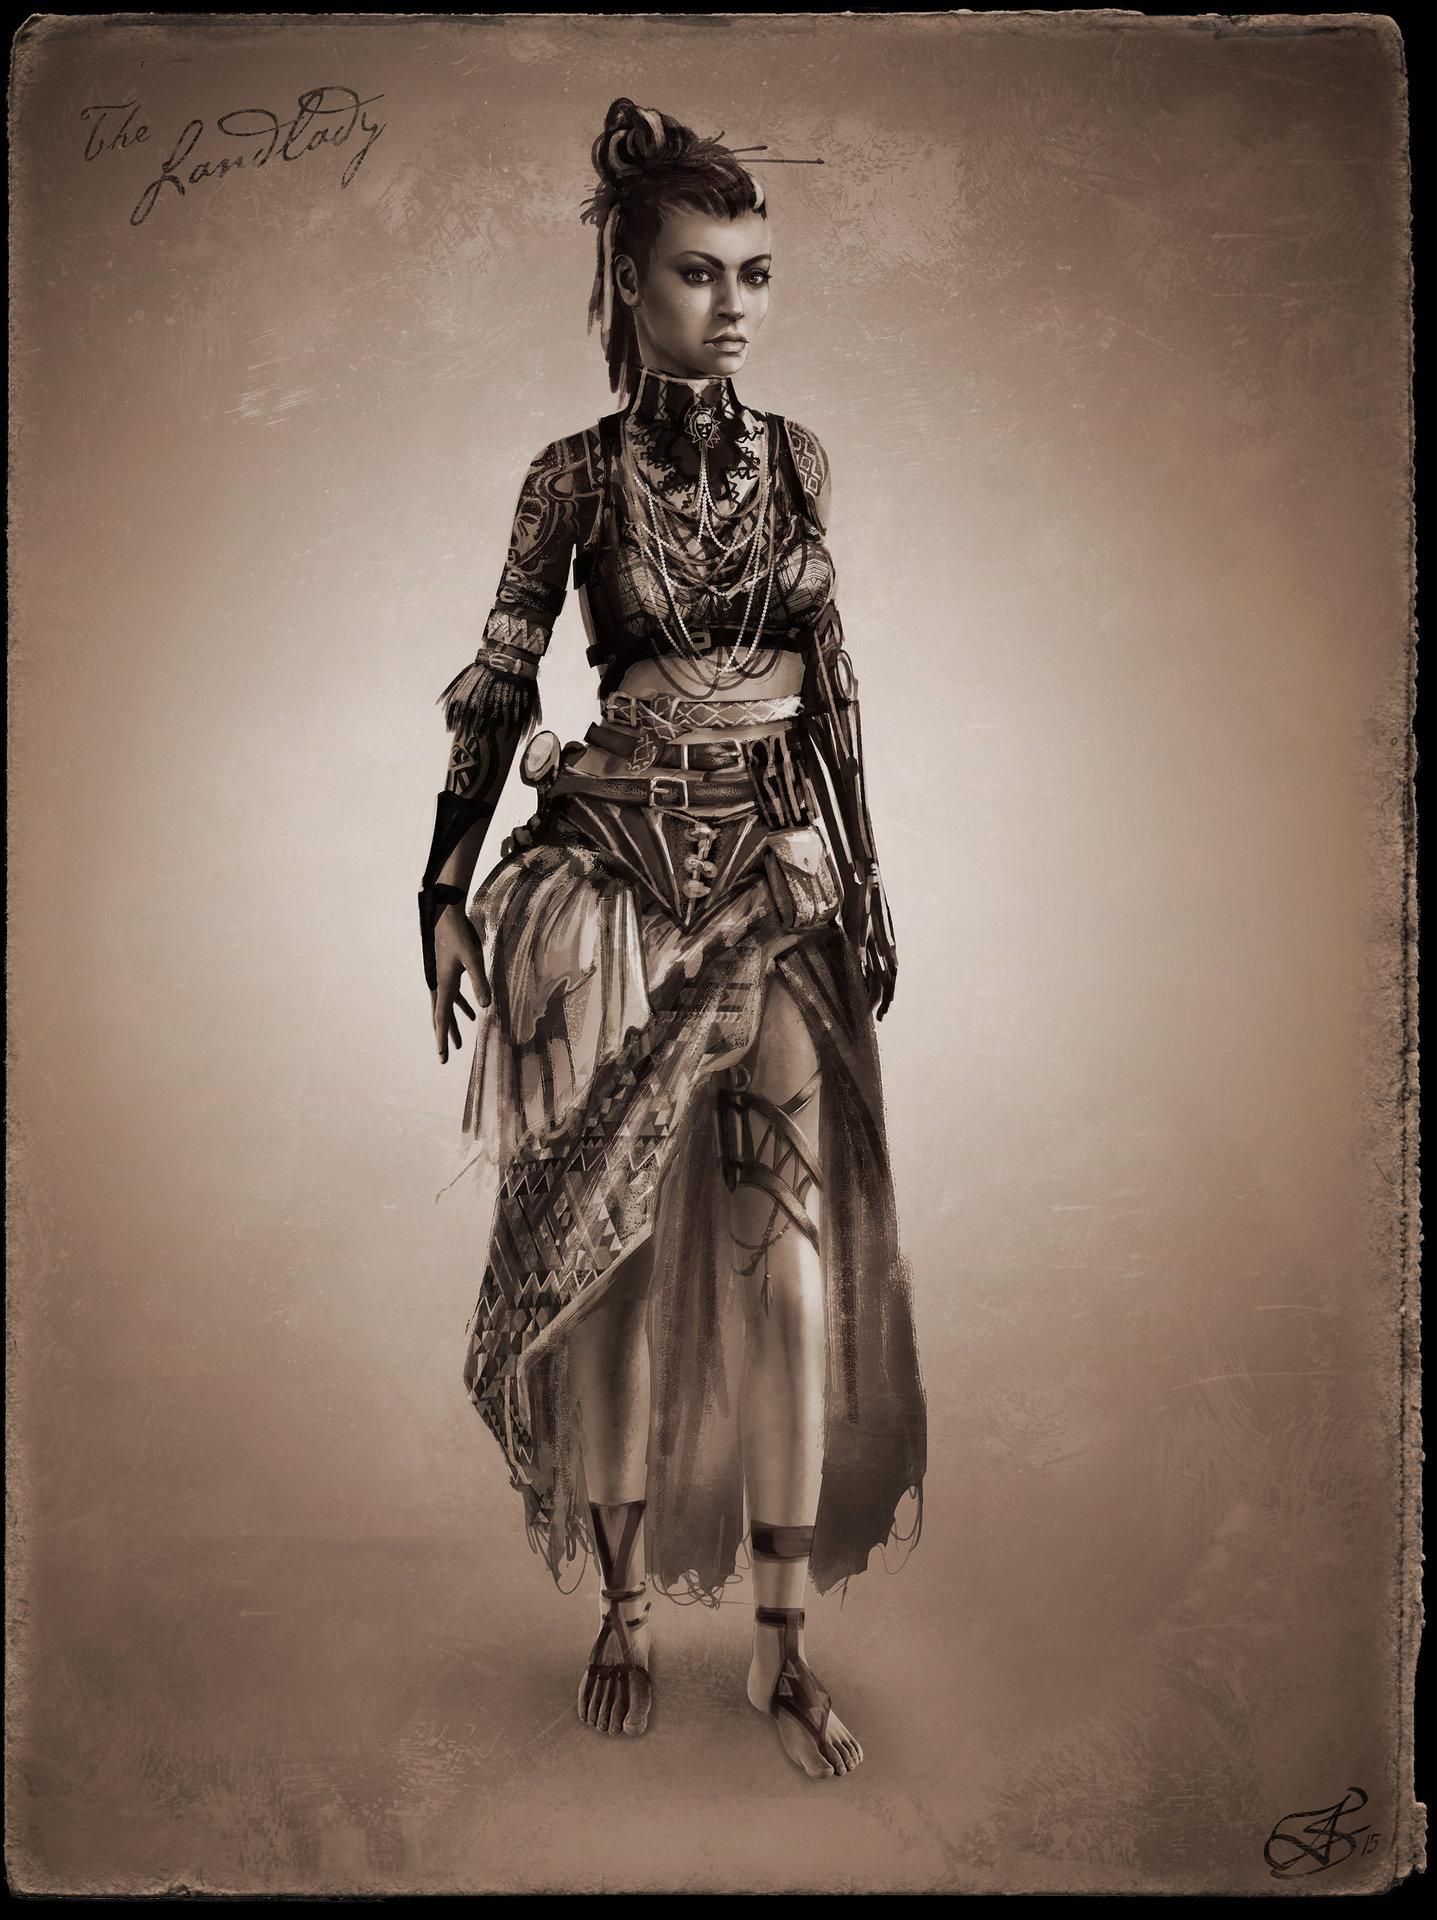 Female Steampunk Concept Art